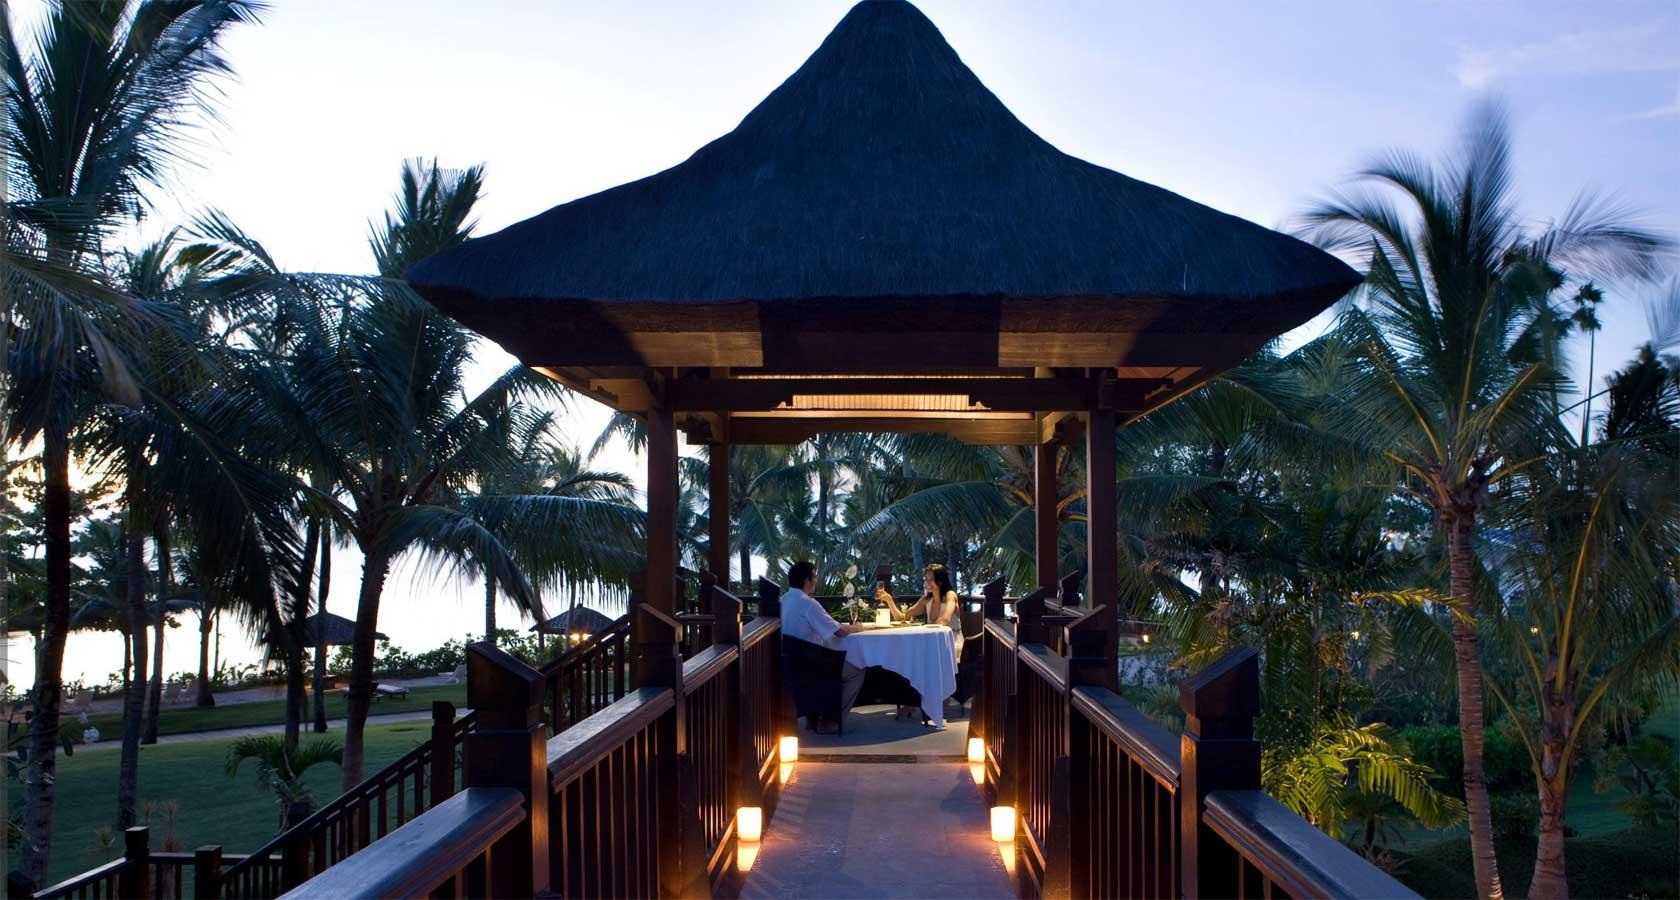 INTERCONTINENTAL BALI RESORT couple dine in pagoda